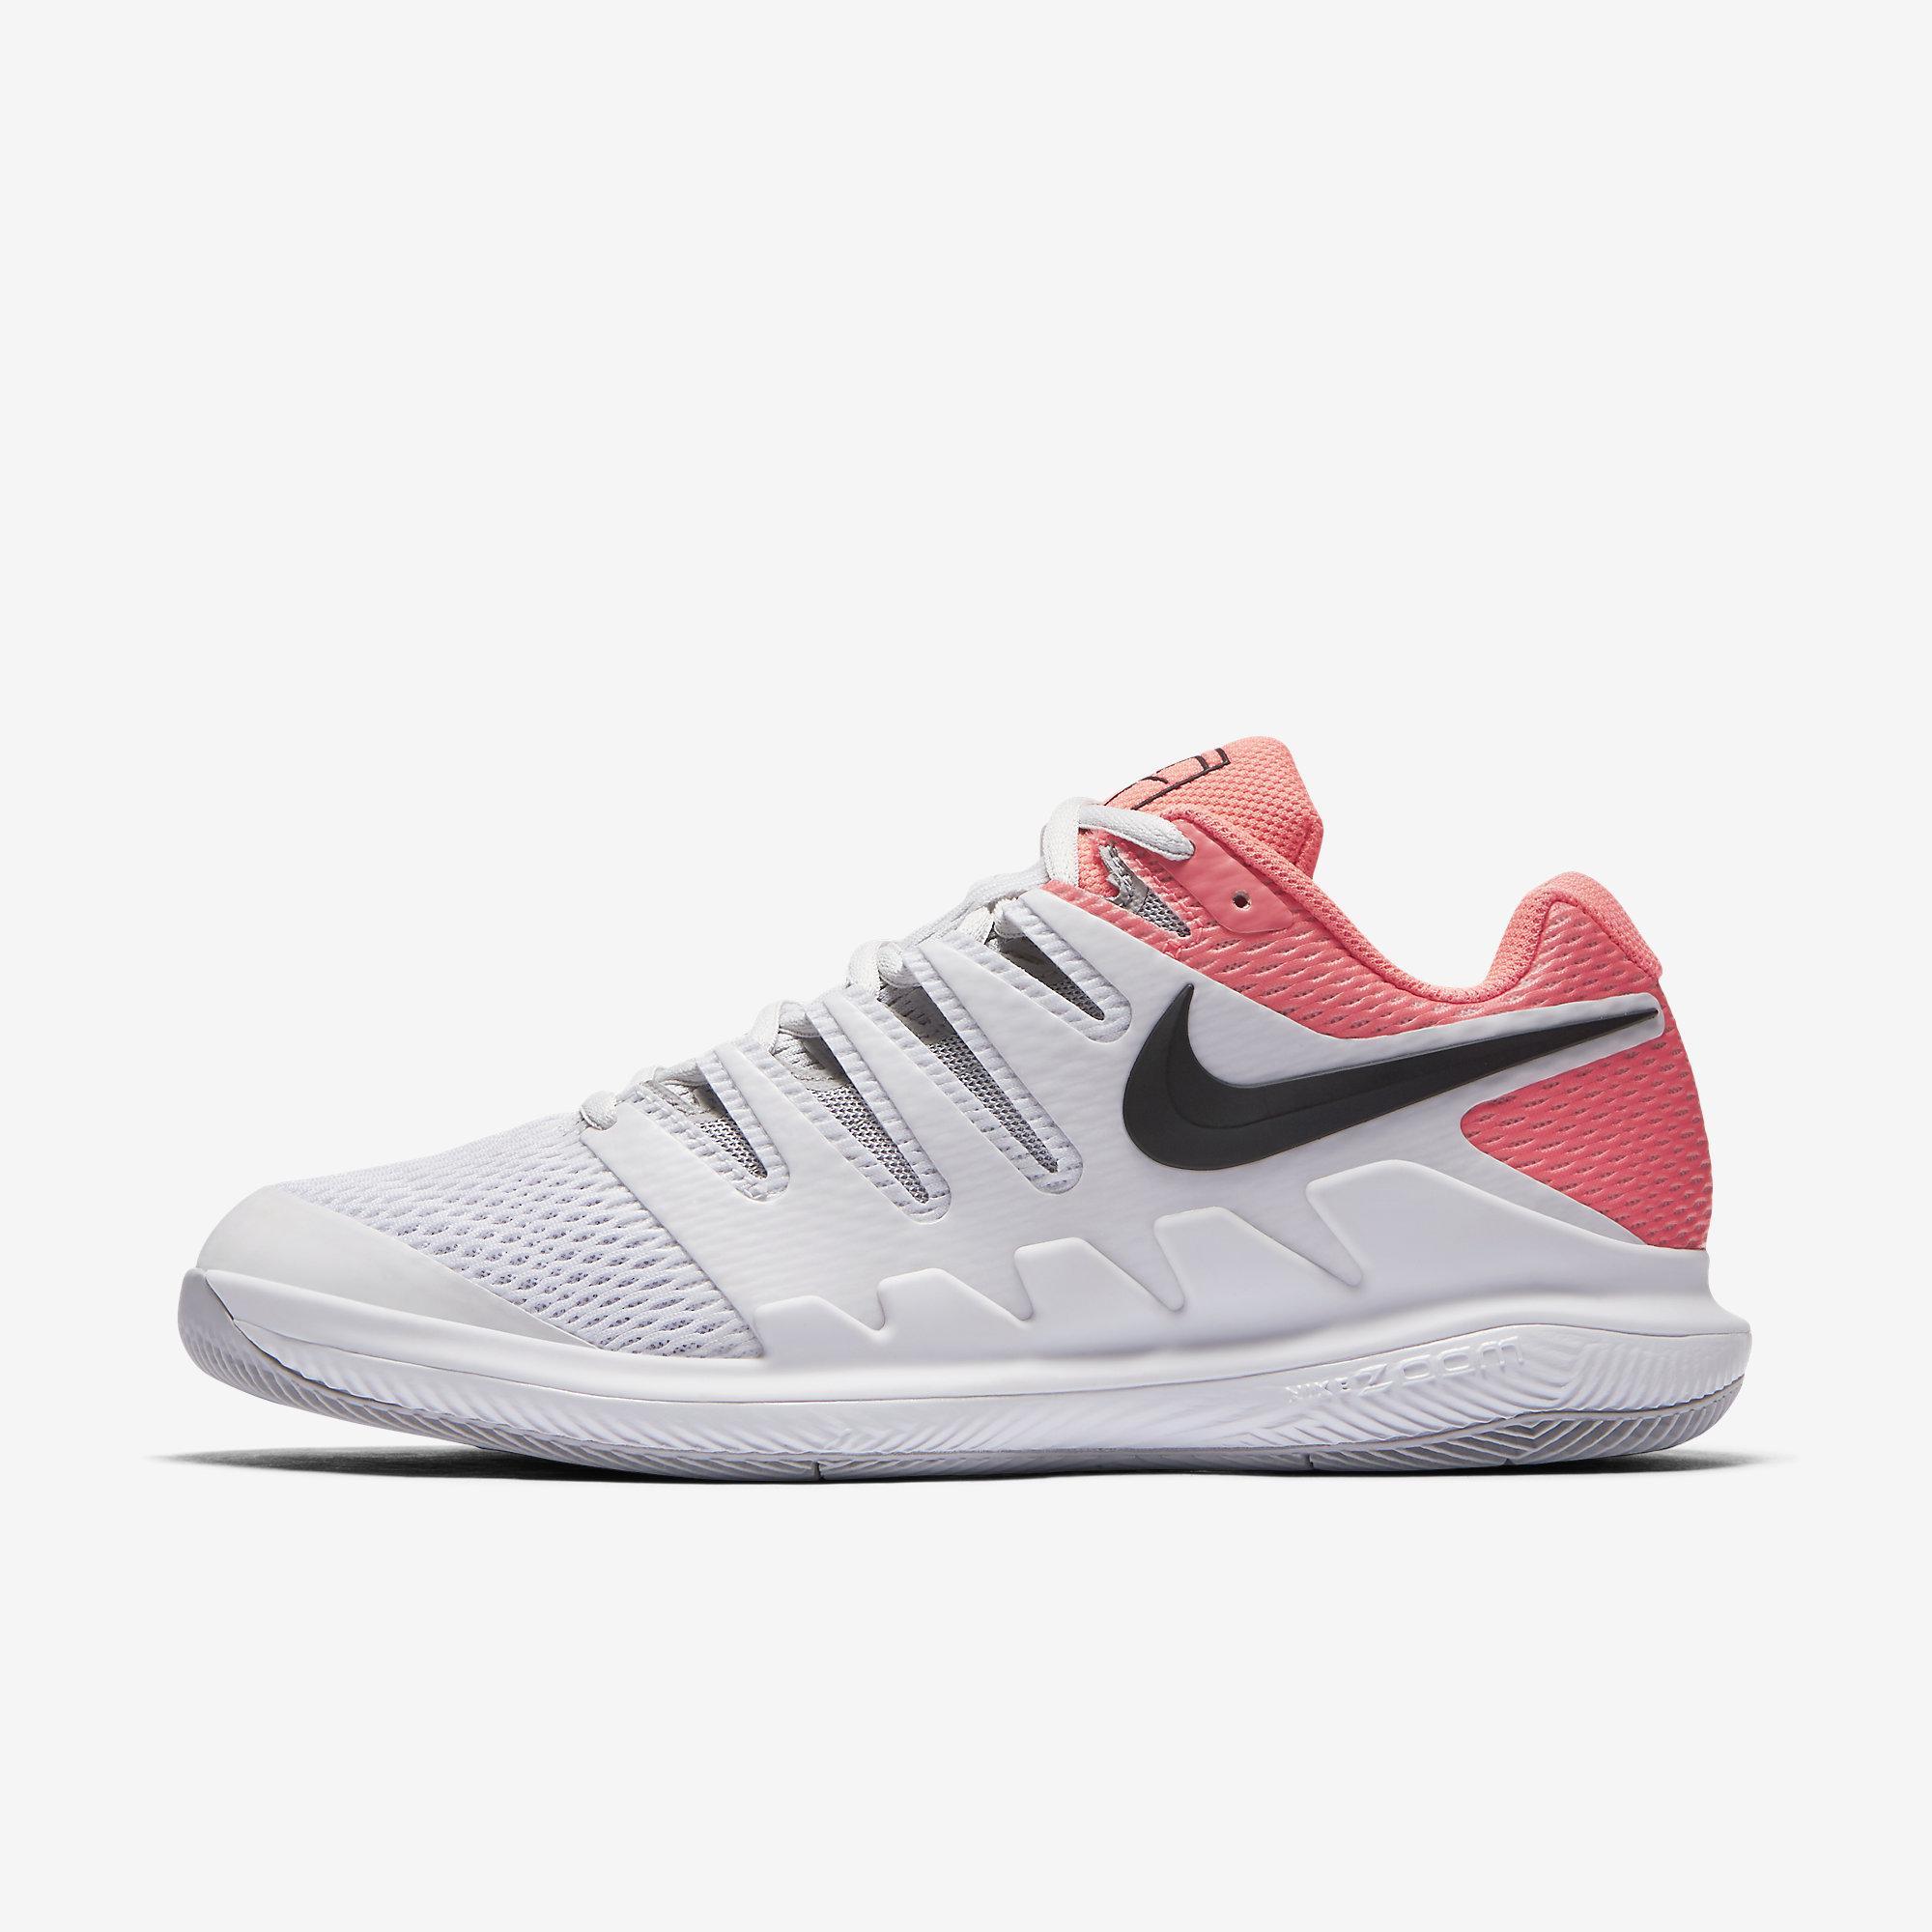 e94192ddc3604 Nike Womens Air Zoom Vapor X Tennis Shoes - Vast Grey - Tennisnuts.com